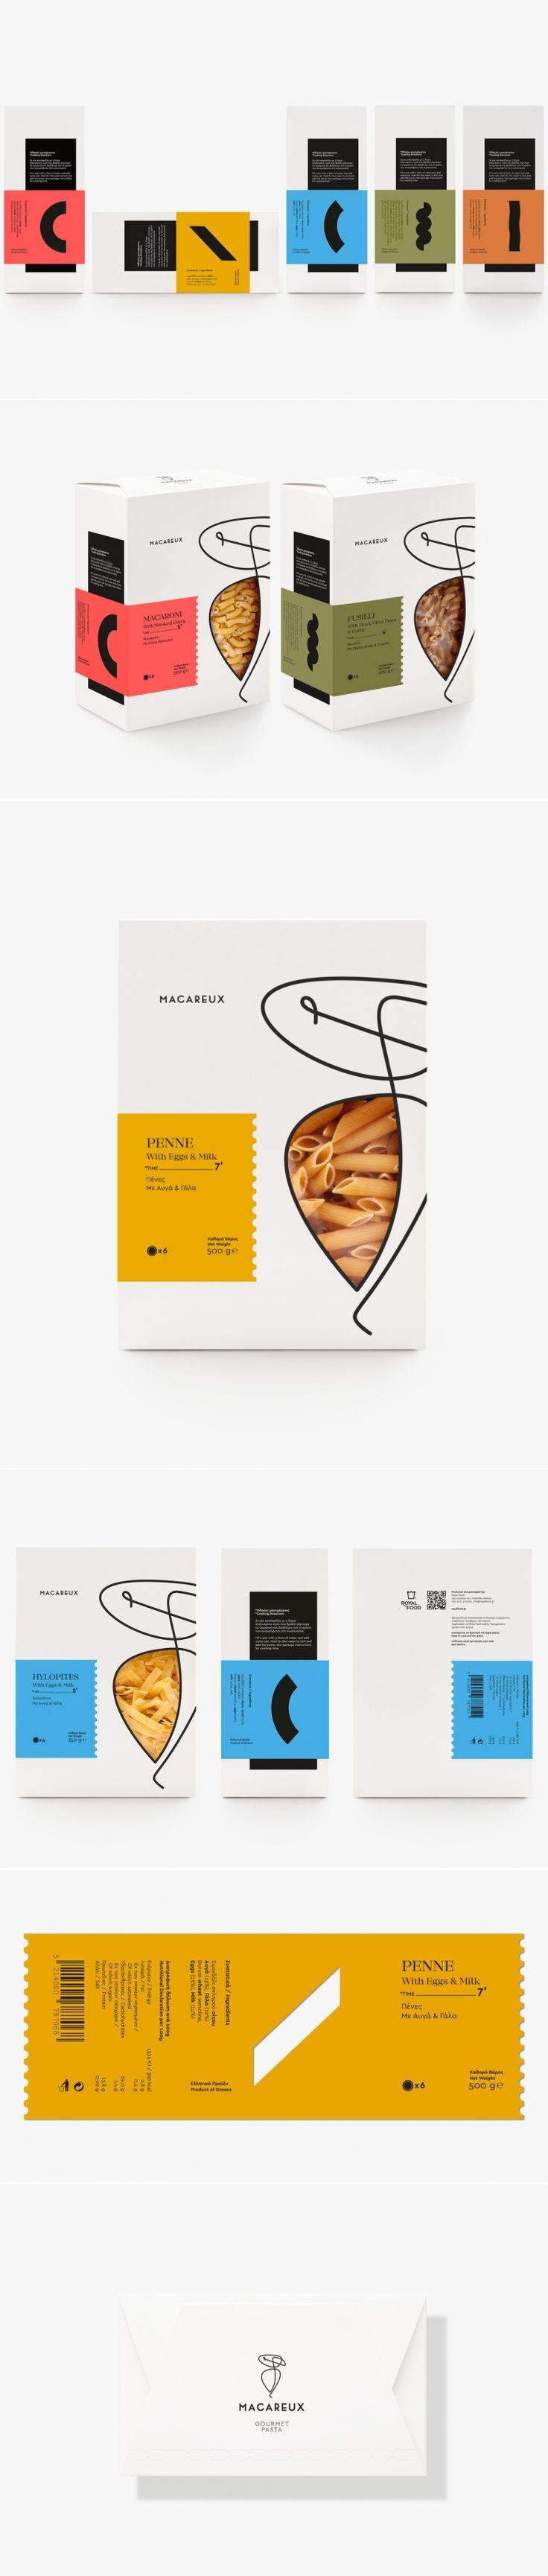 Macareux Pasta — The Dieline - Branding & Packaging Design